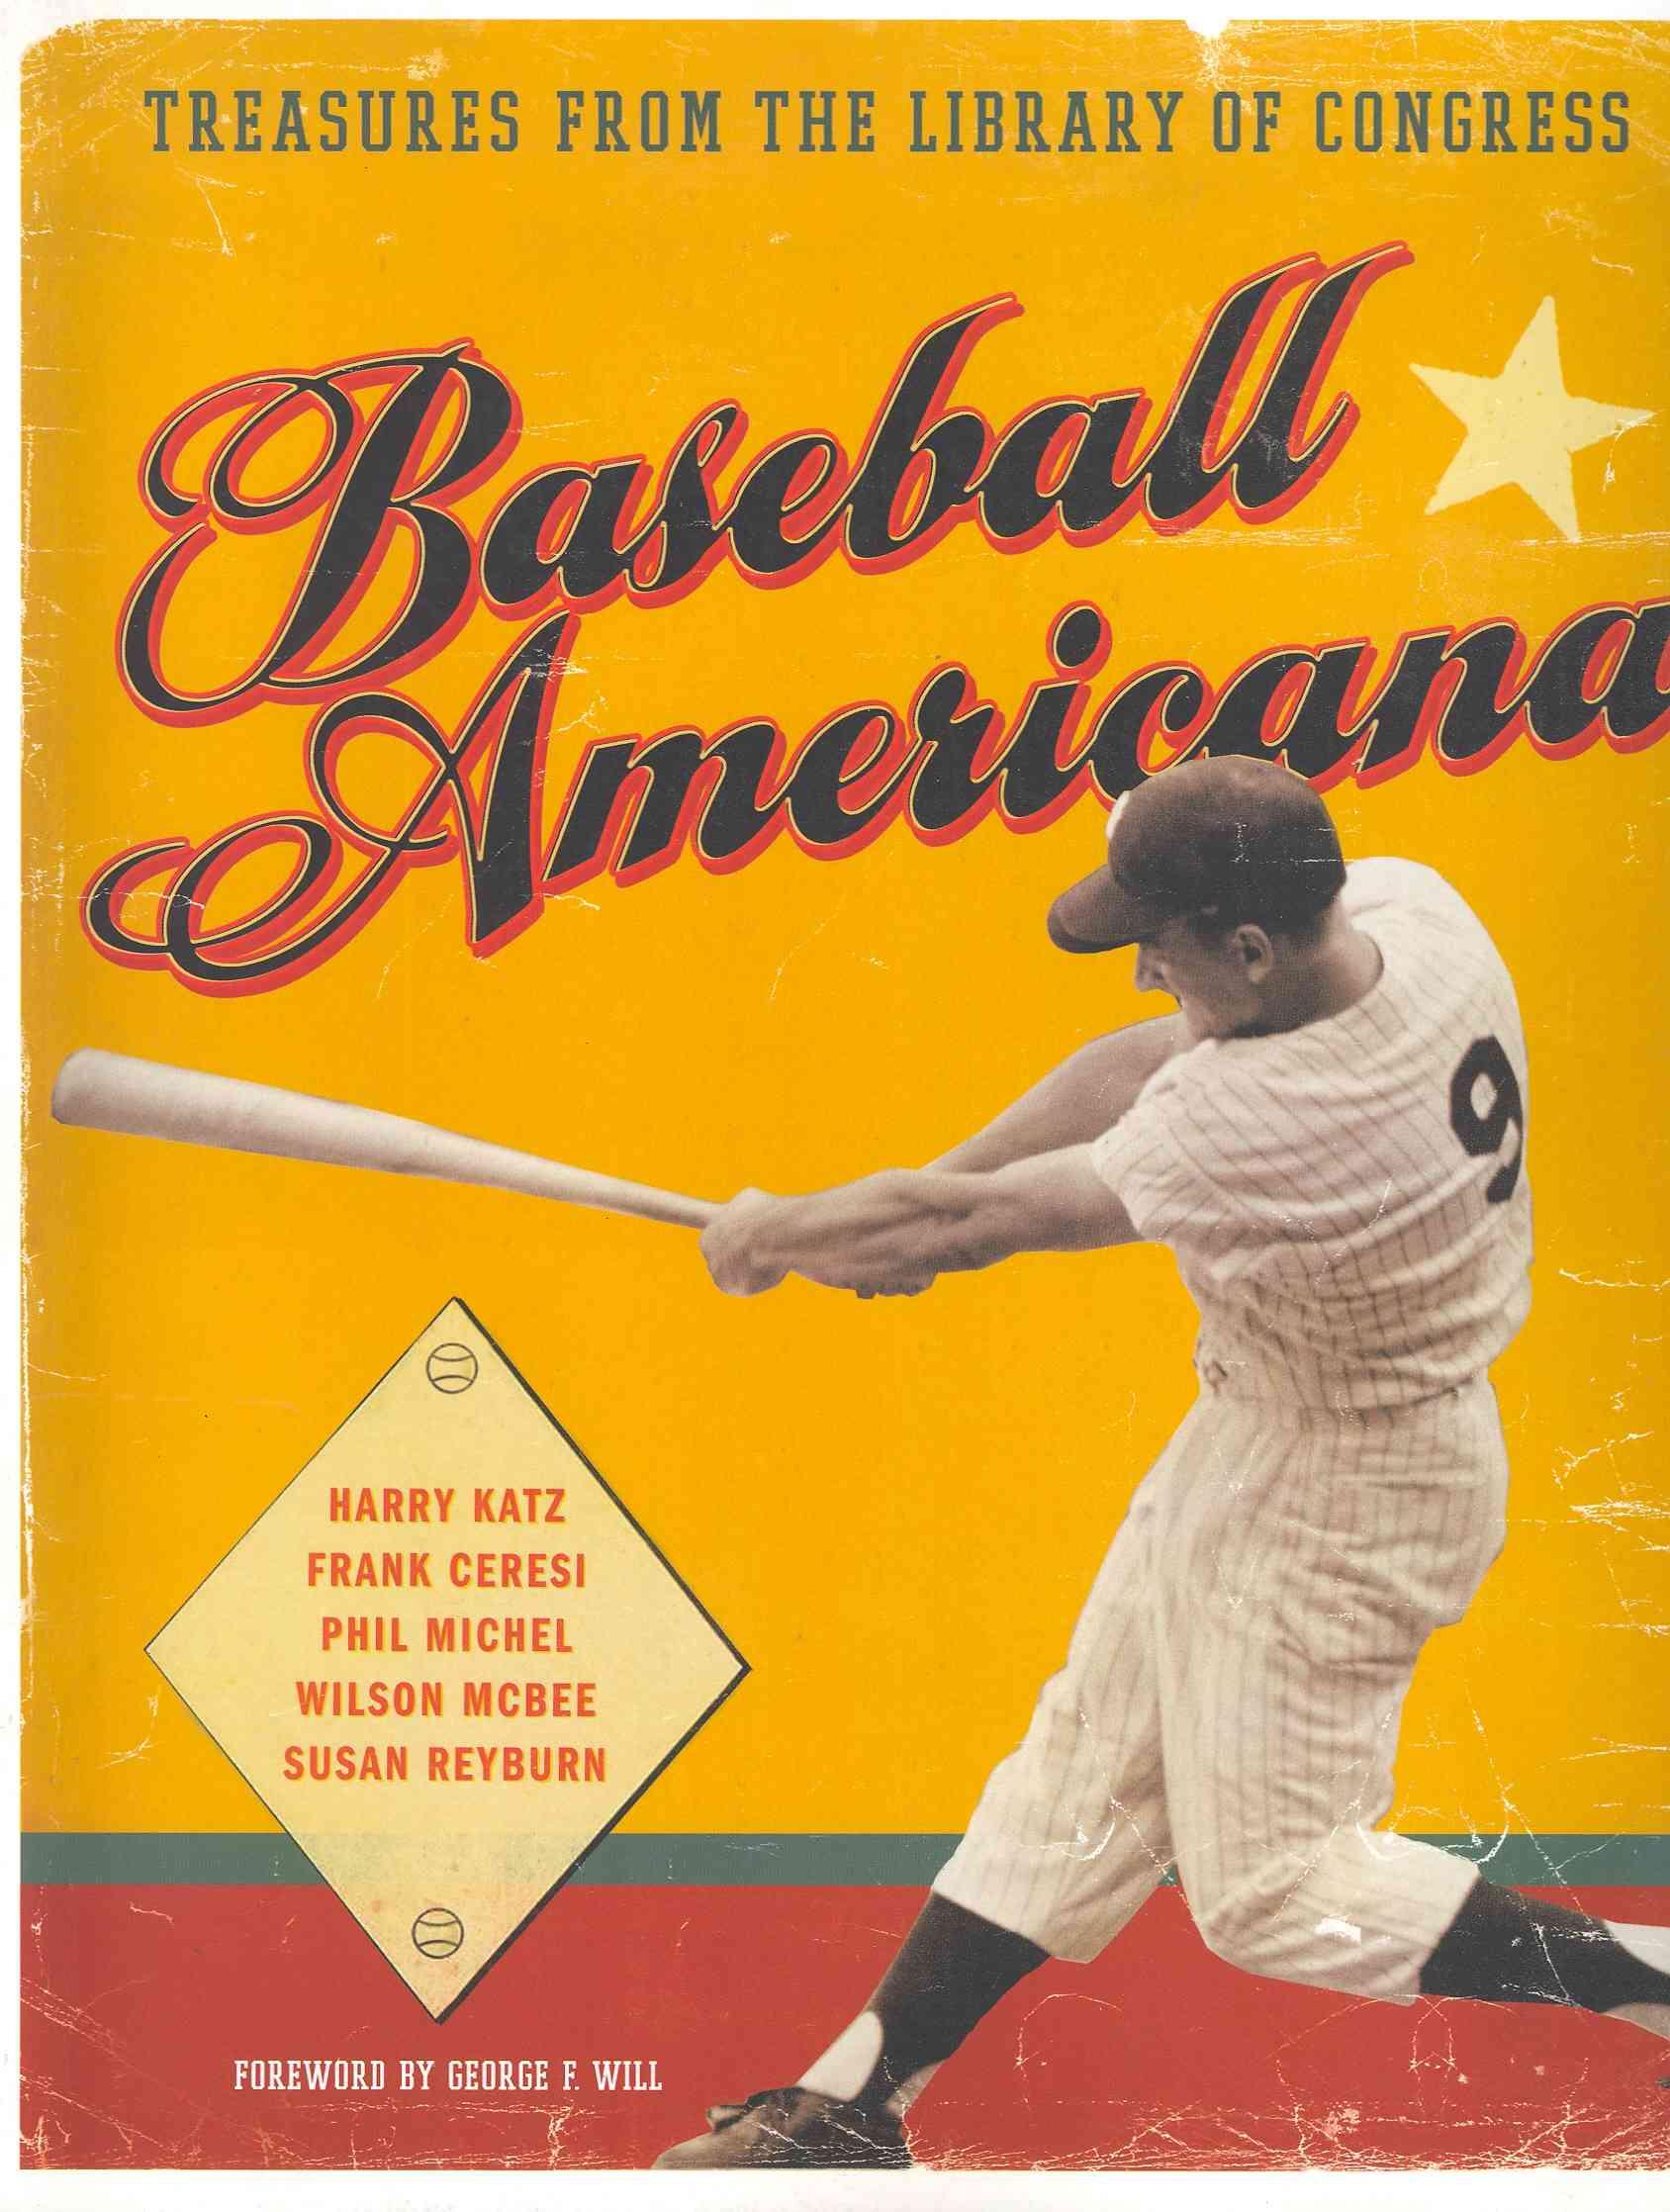 Baseball Americana By Katz, Harry/ Ceresi, Frank